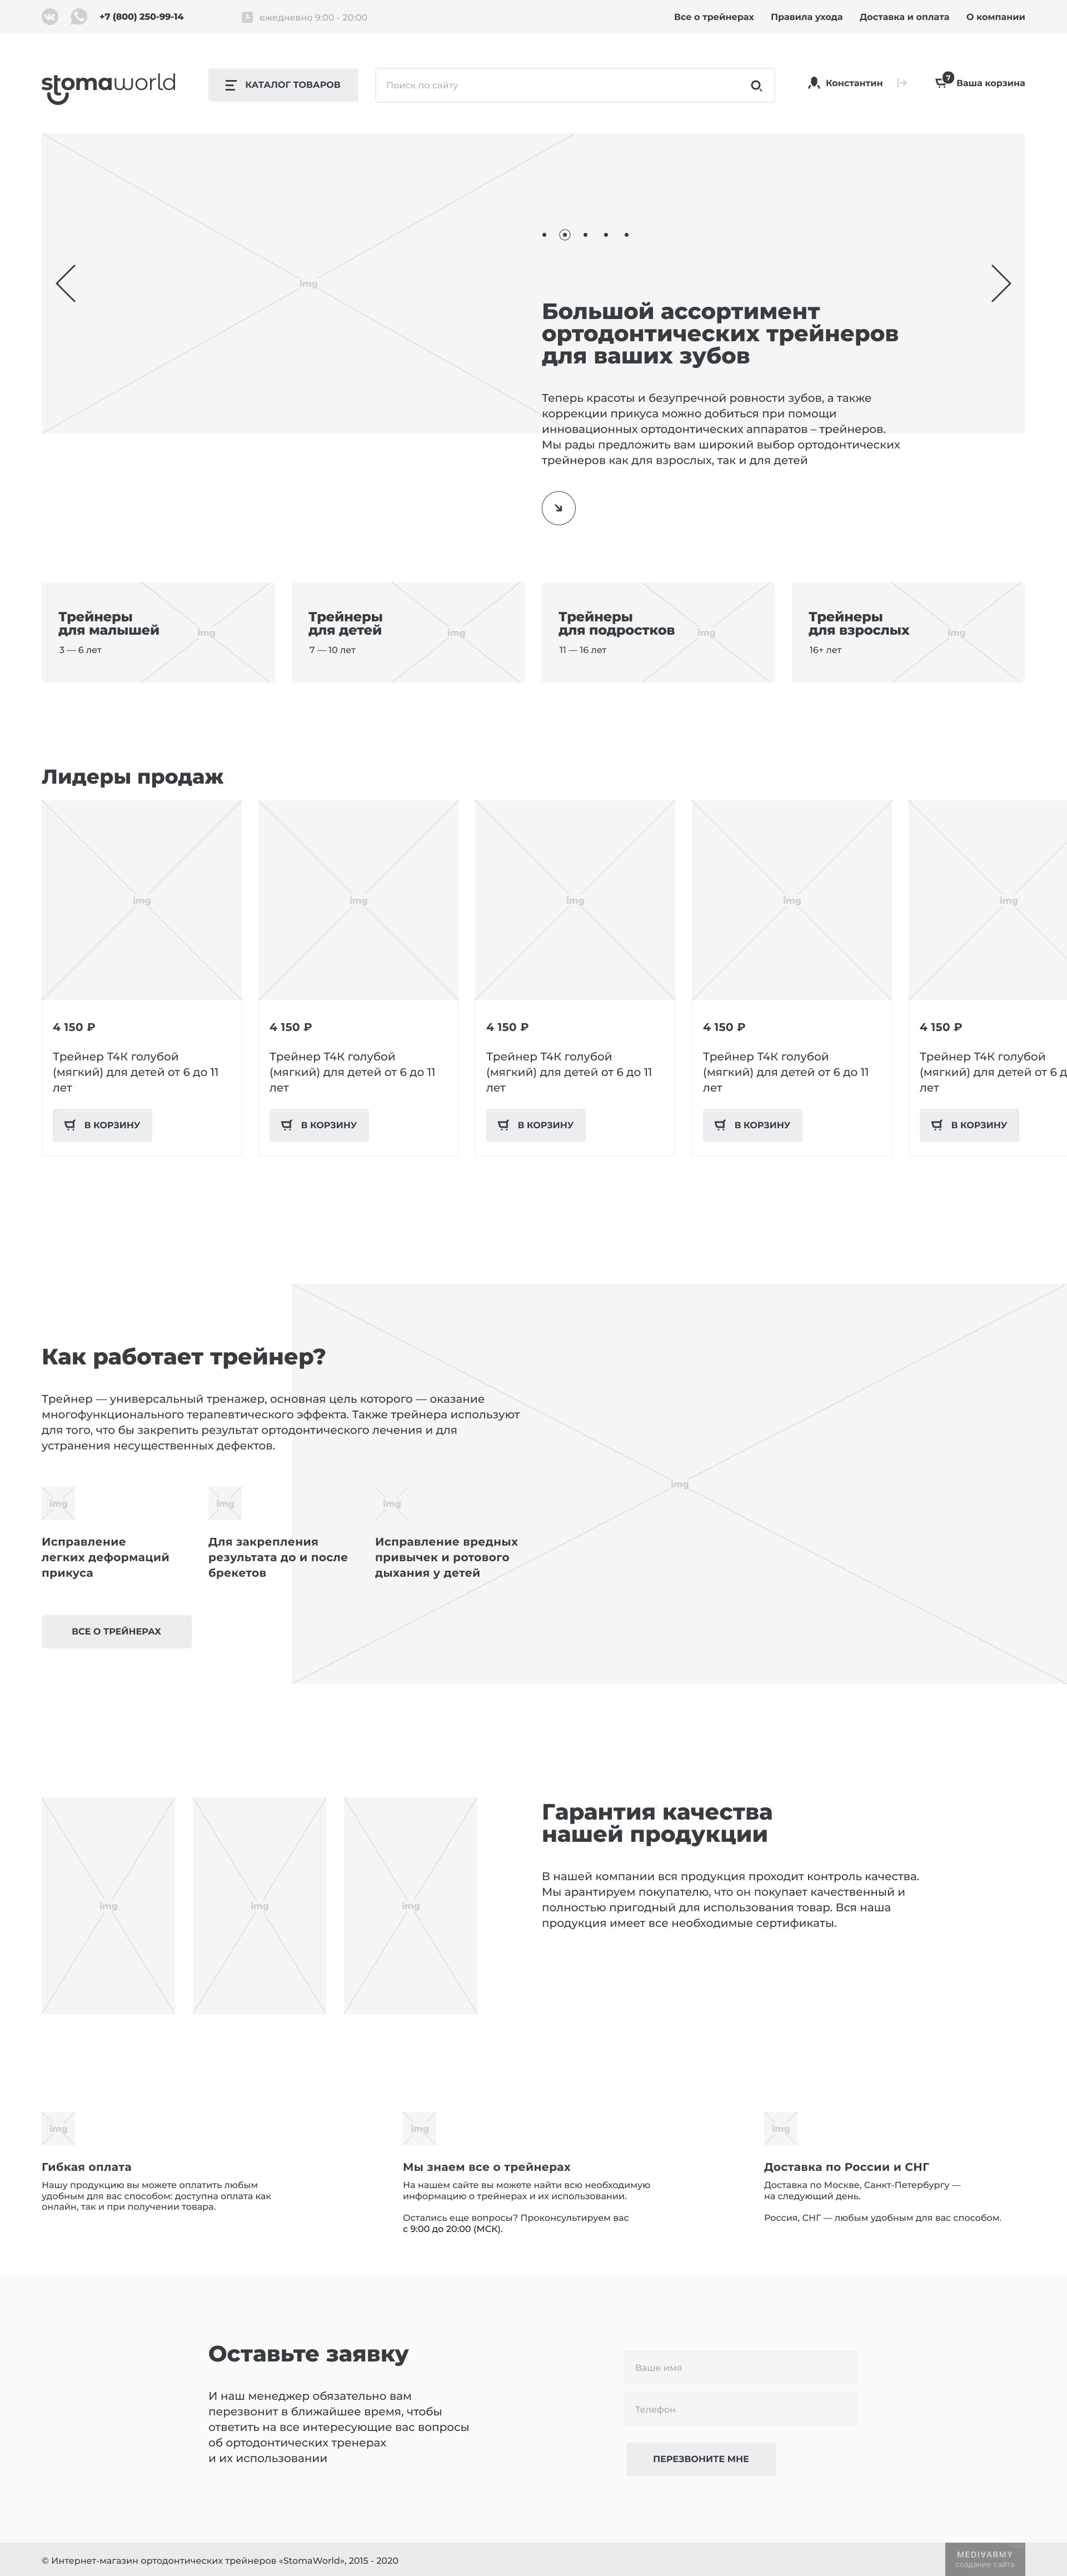 stomaworld_prototype.png